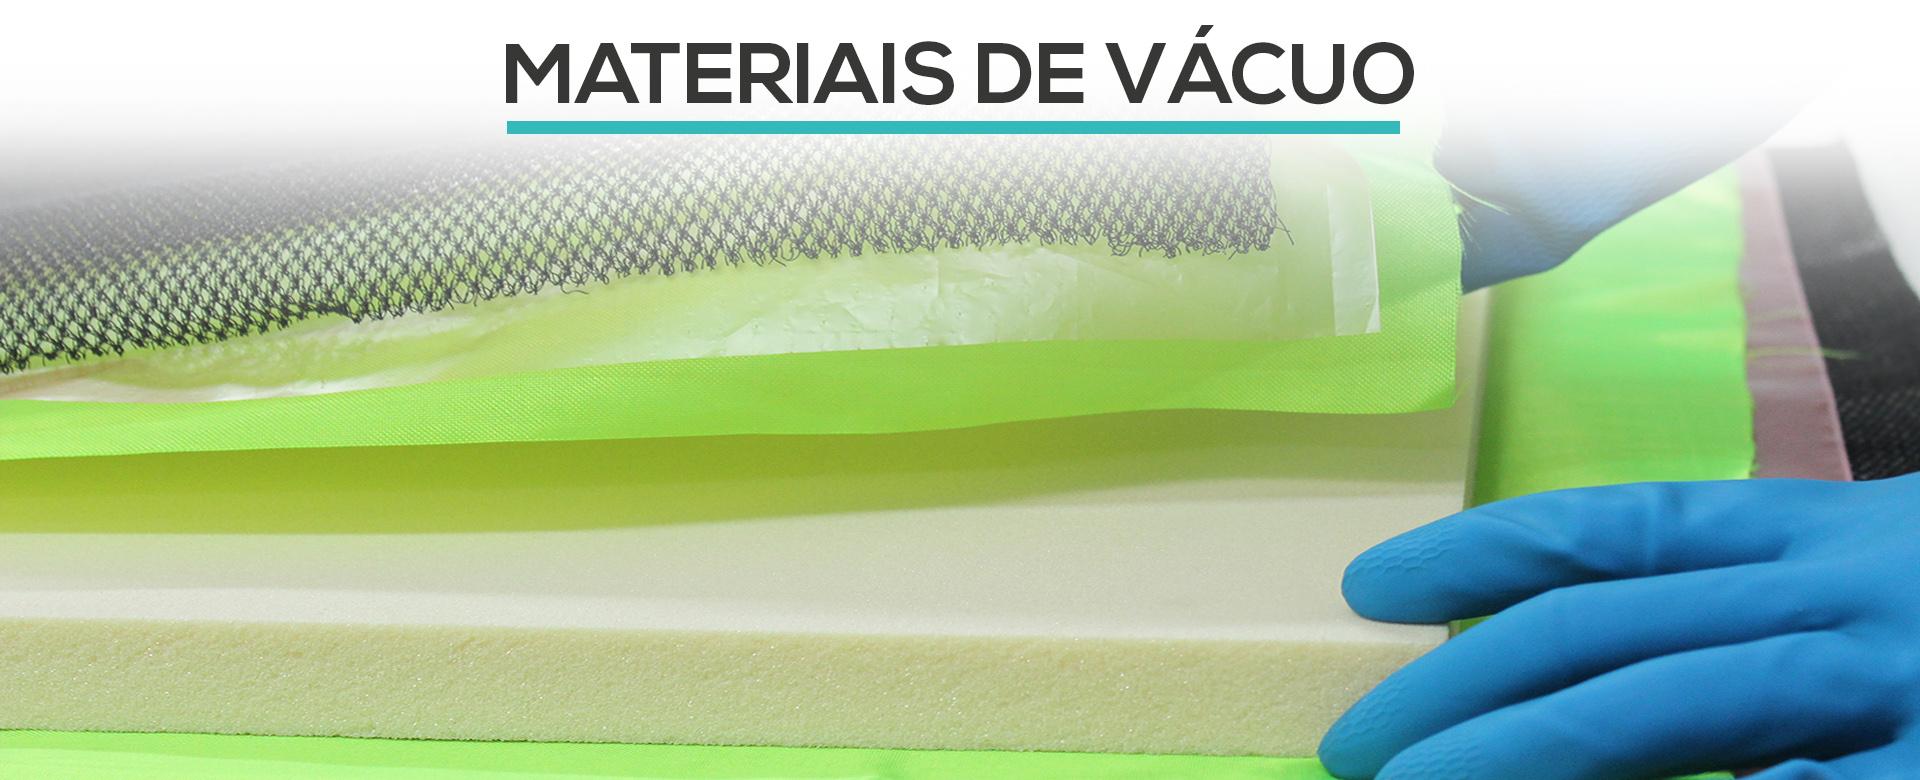 Materiais de Vacuo